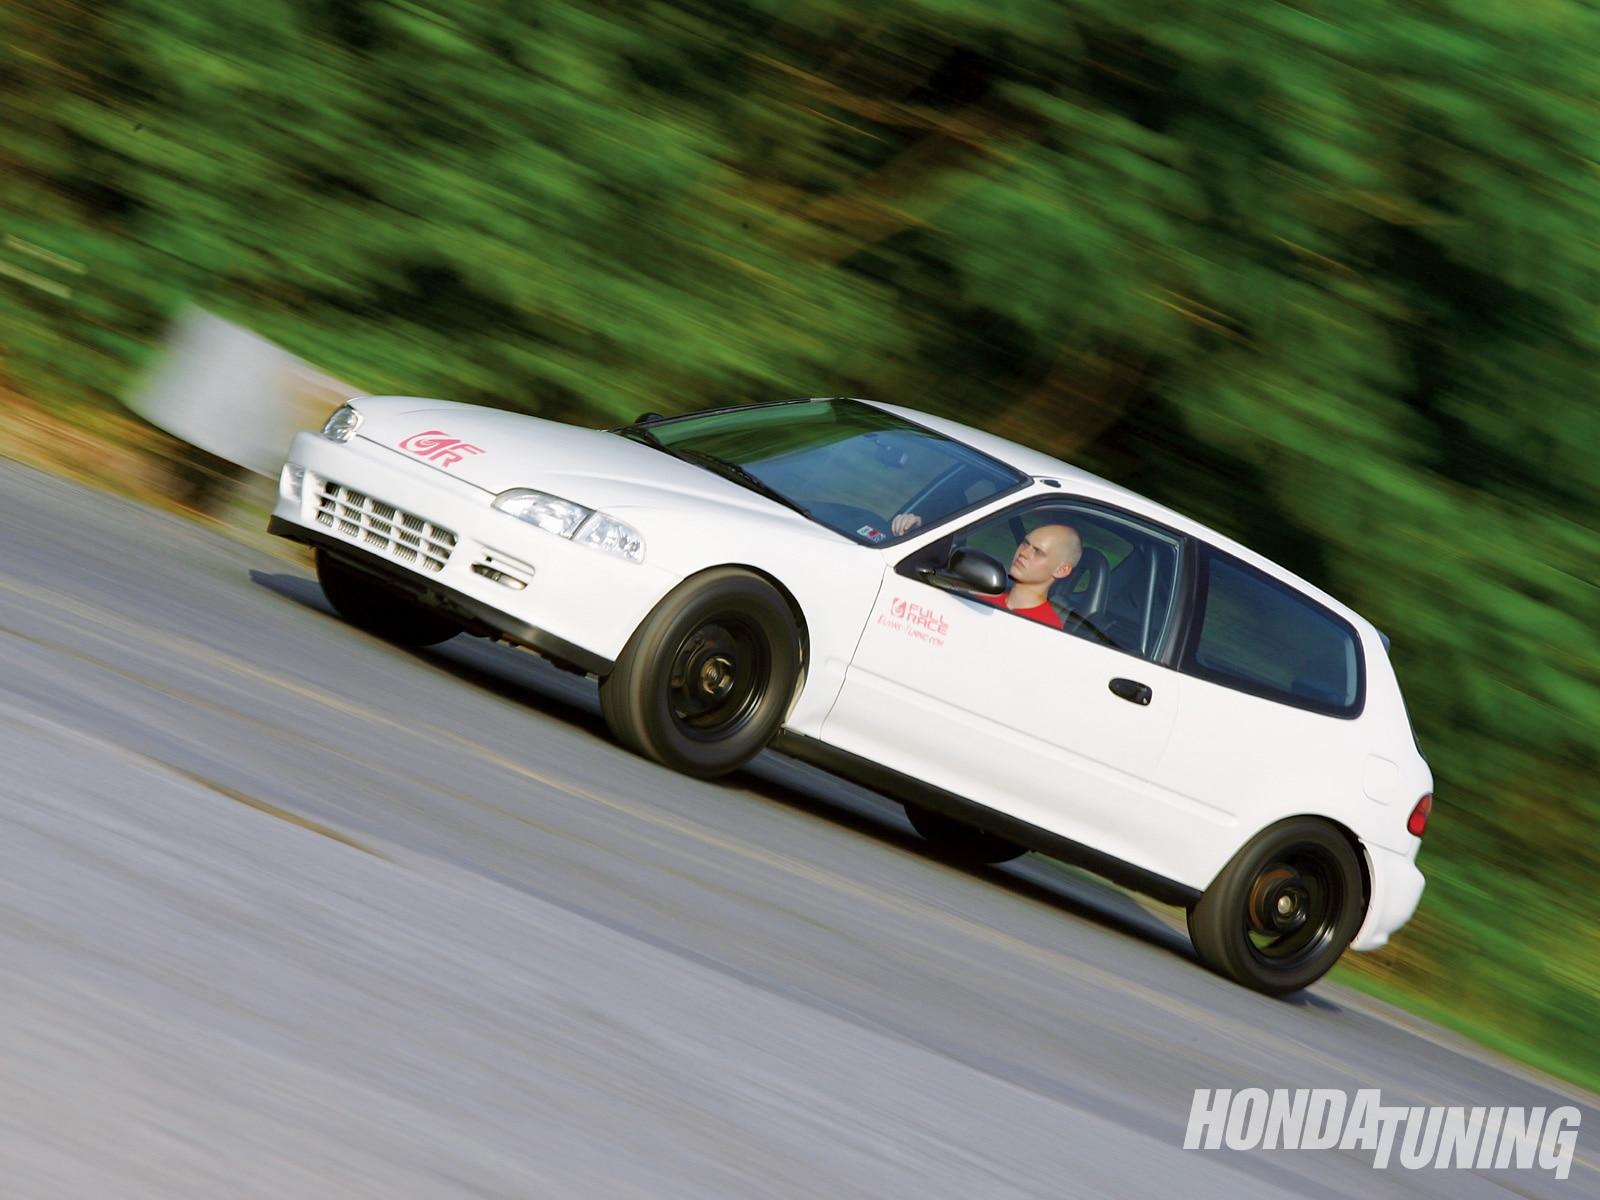 Engine Wiring 1992 95 Civic Vx Chassis Wiring 1992 95 Civic 1993 95